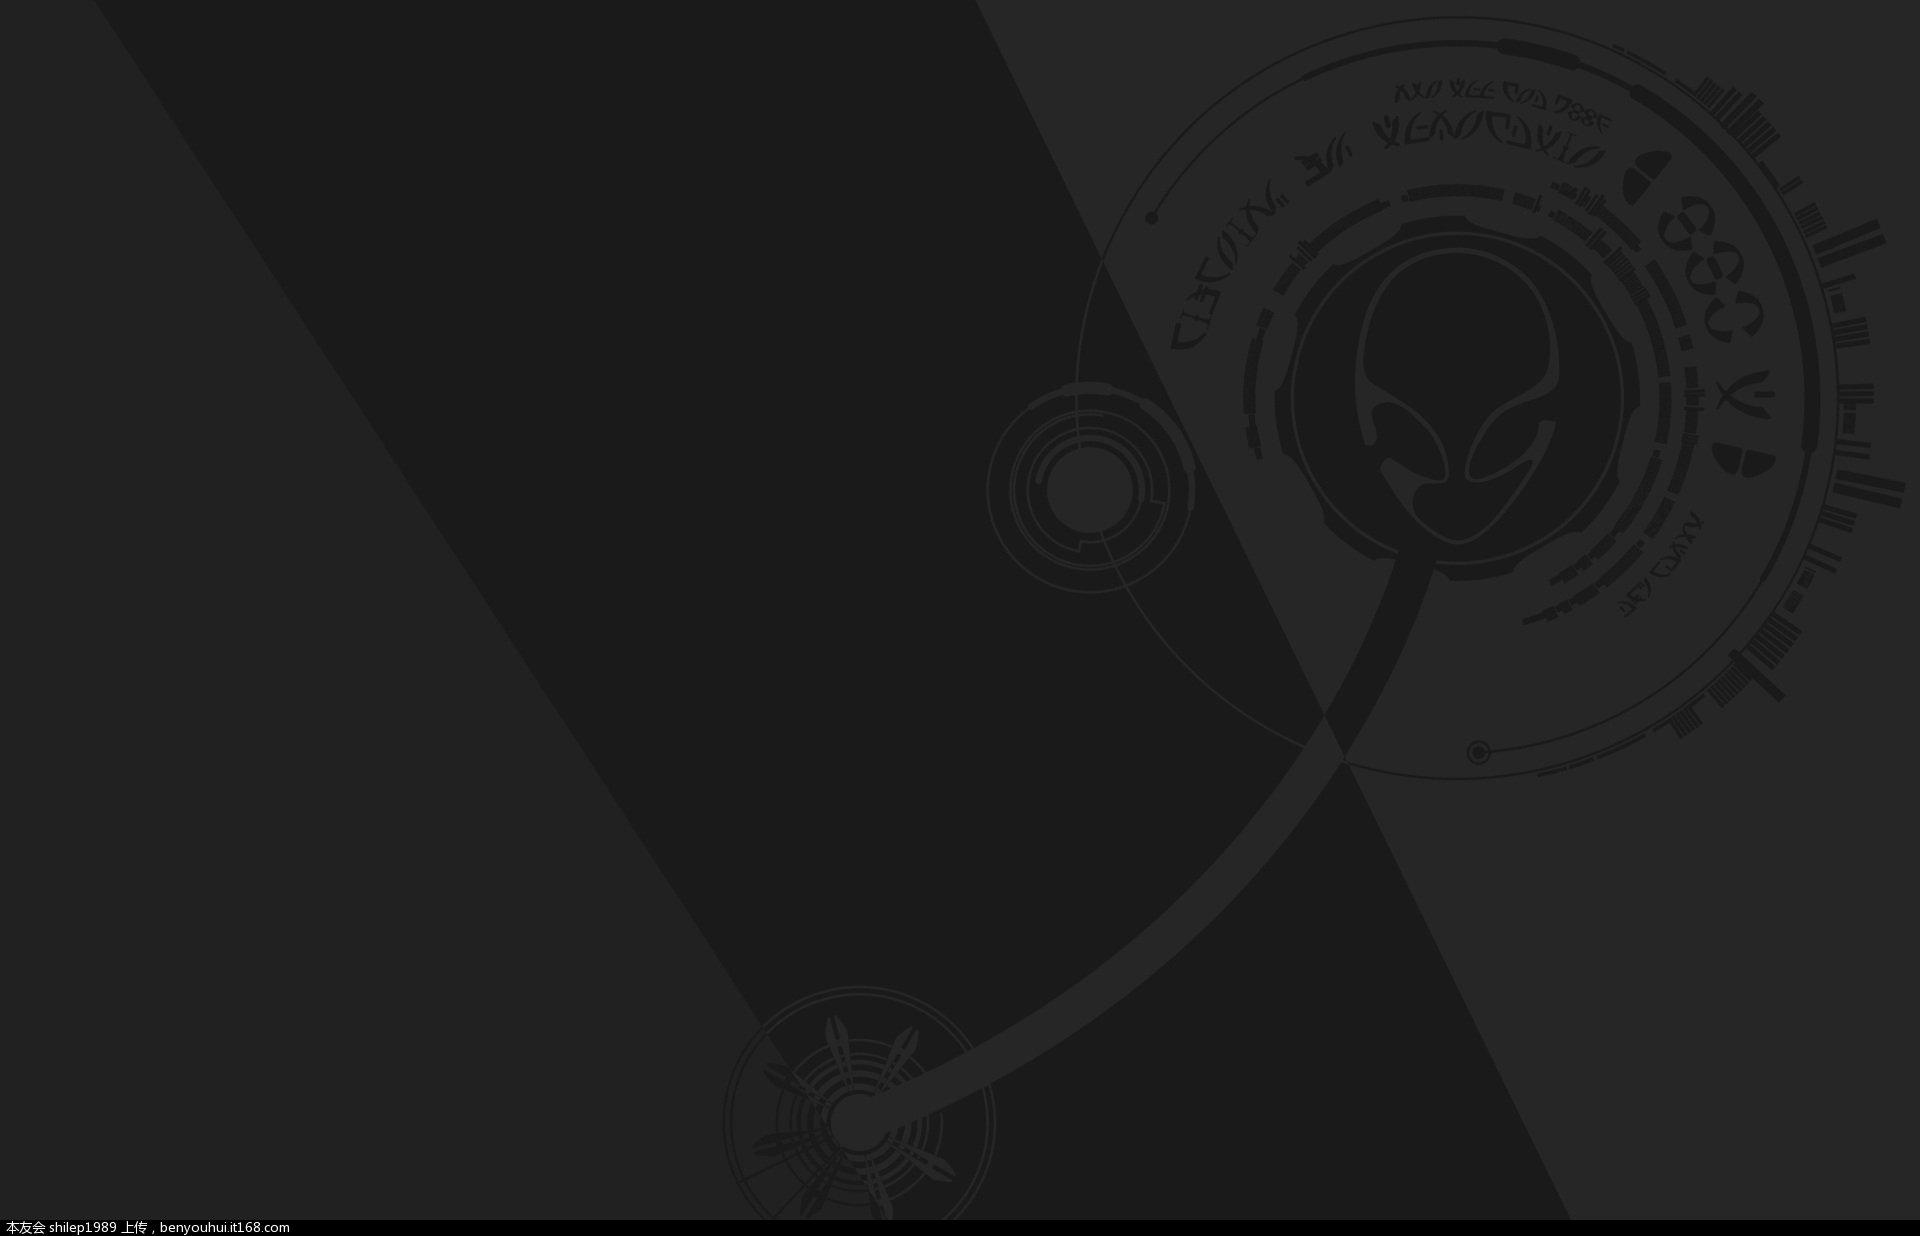 【theme】外星人主题_戴尔外星人论坛